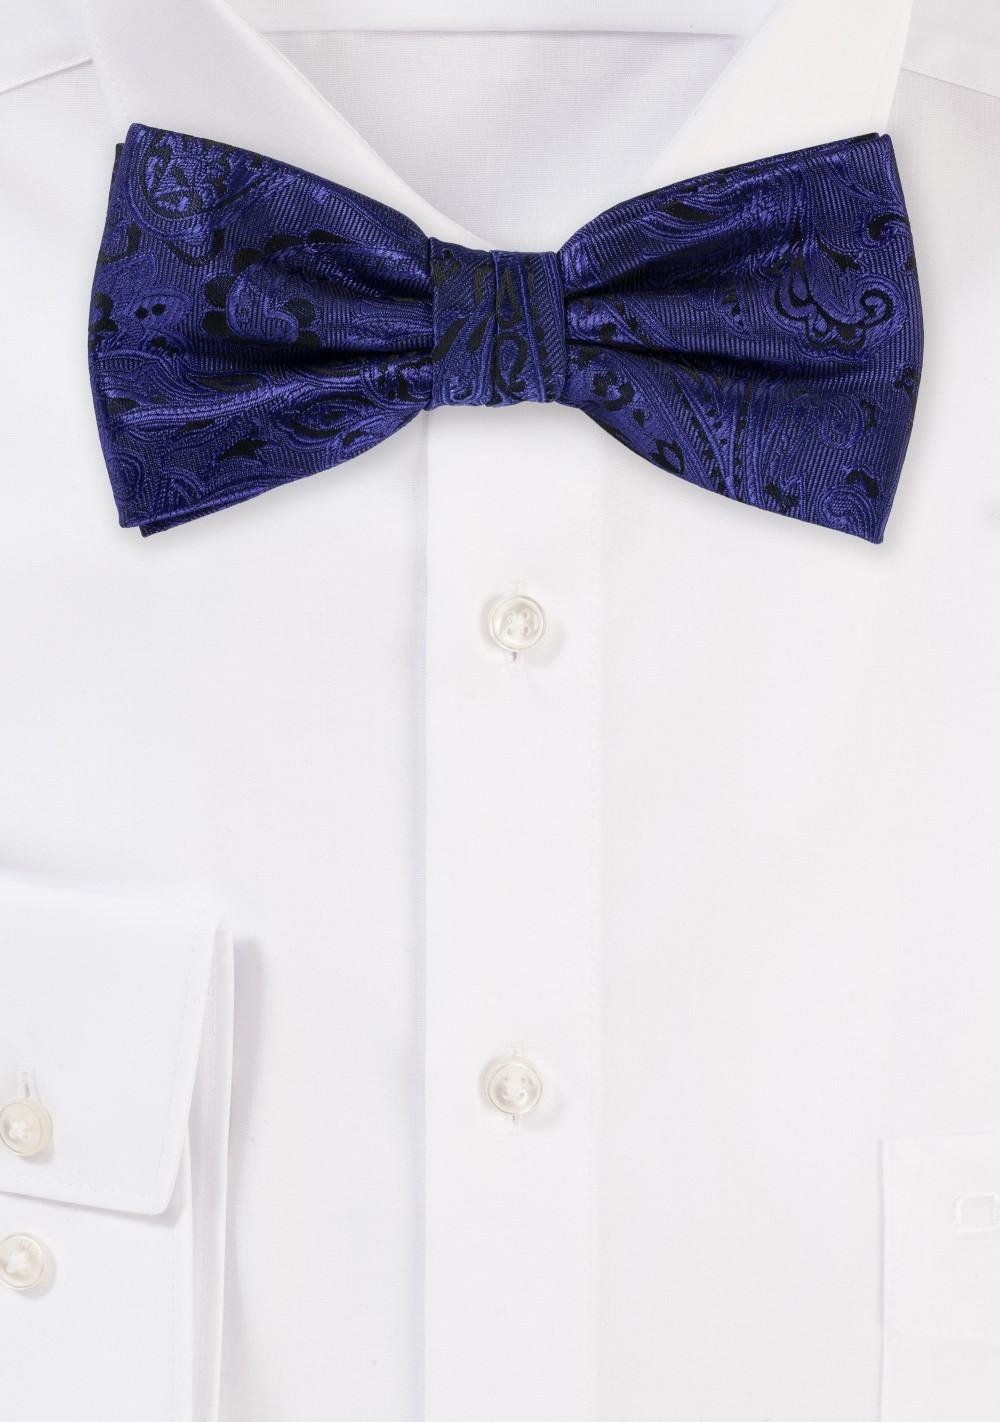 Ultramarine Mens Bow Tie